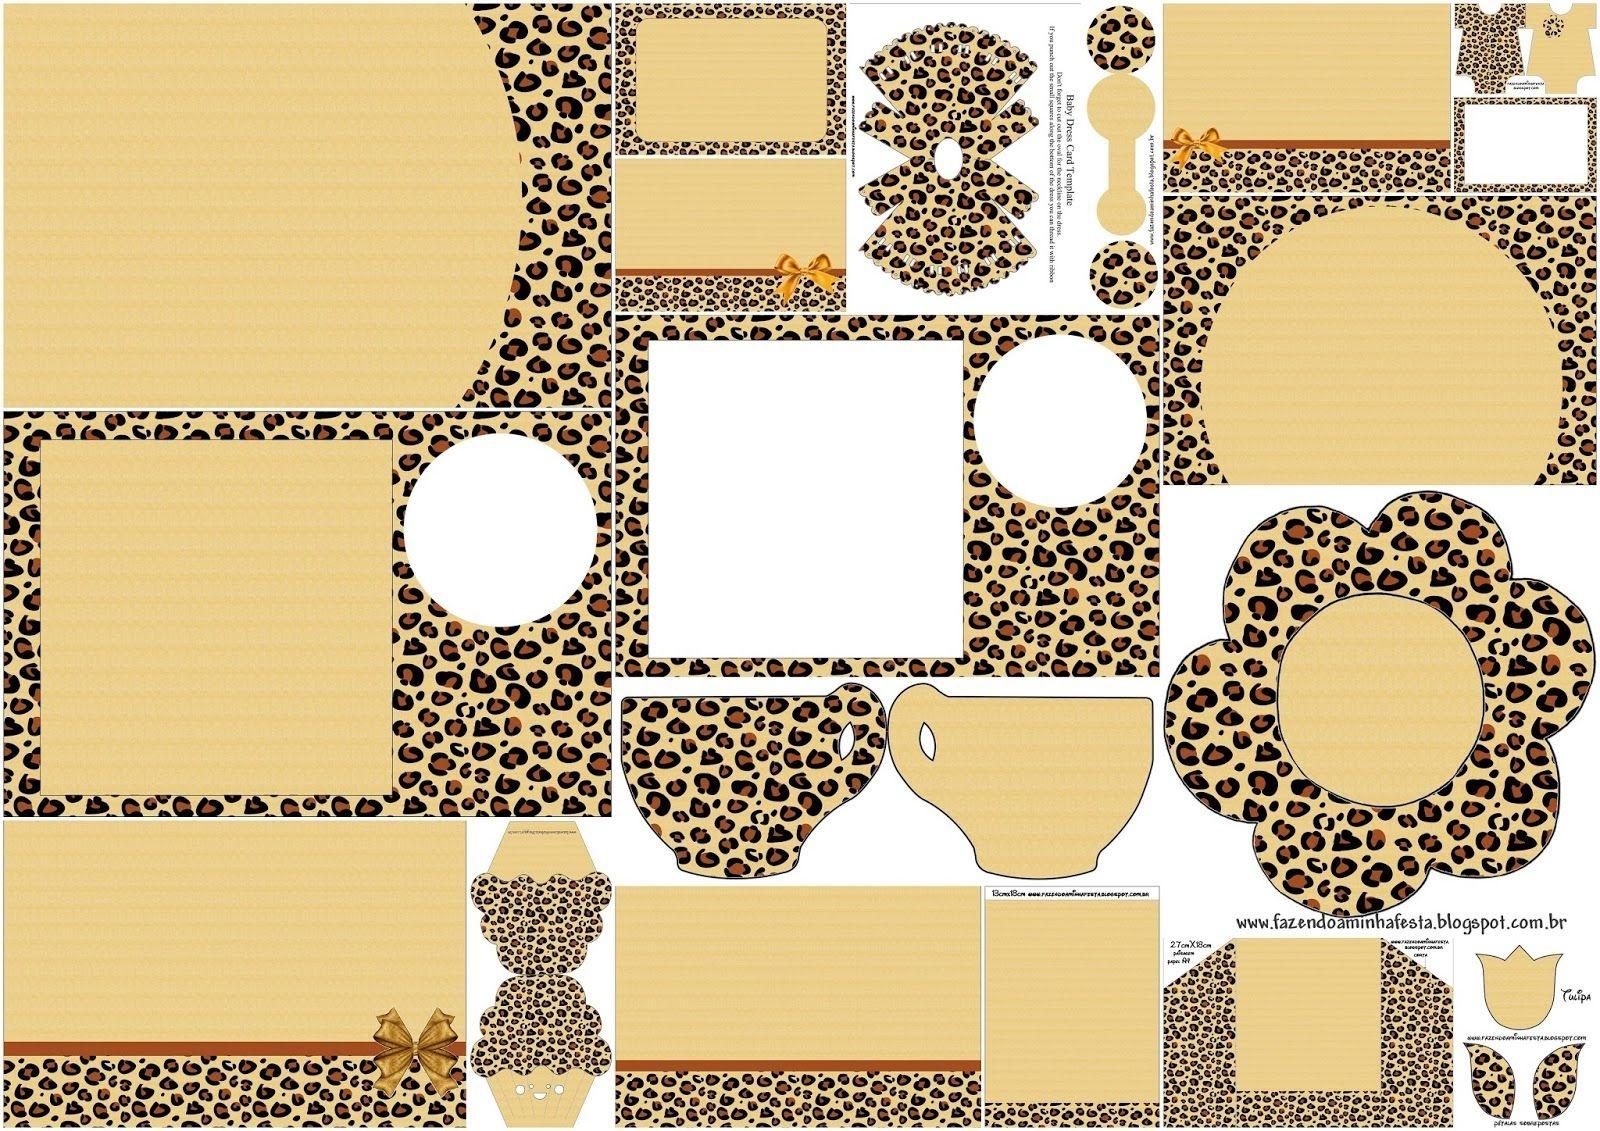 Leopard Prints: Free Printable Invitation. | Party | Free Printable - Free Printable Cheetah Birthday Invitations